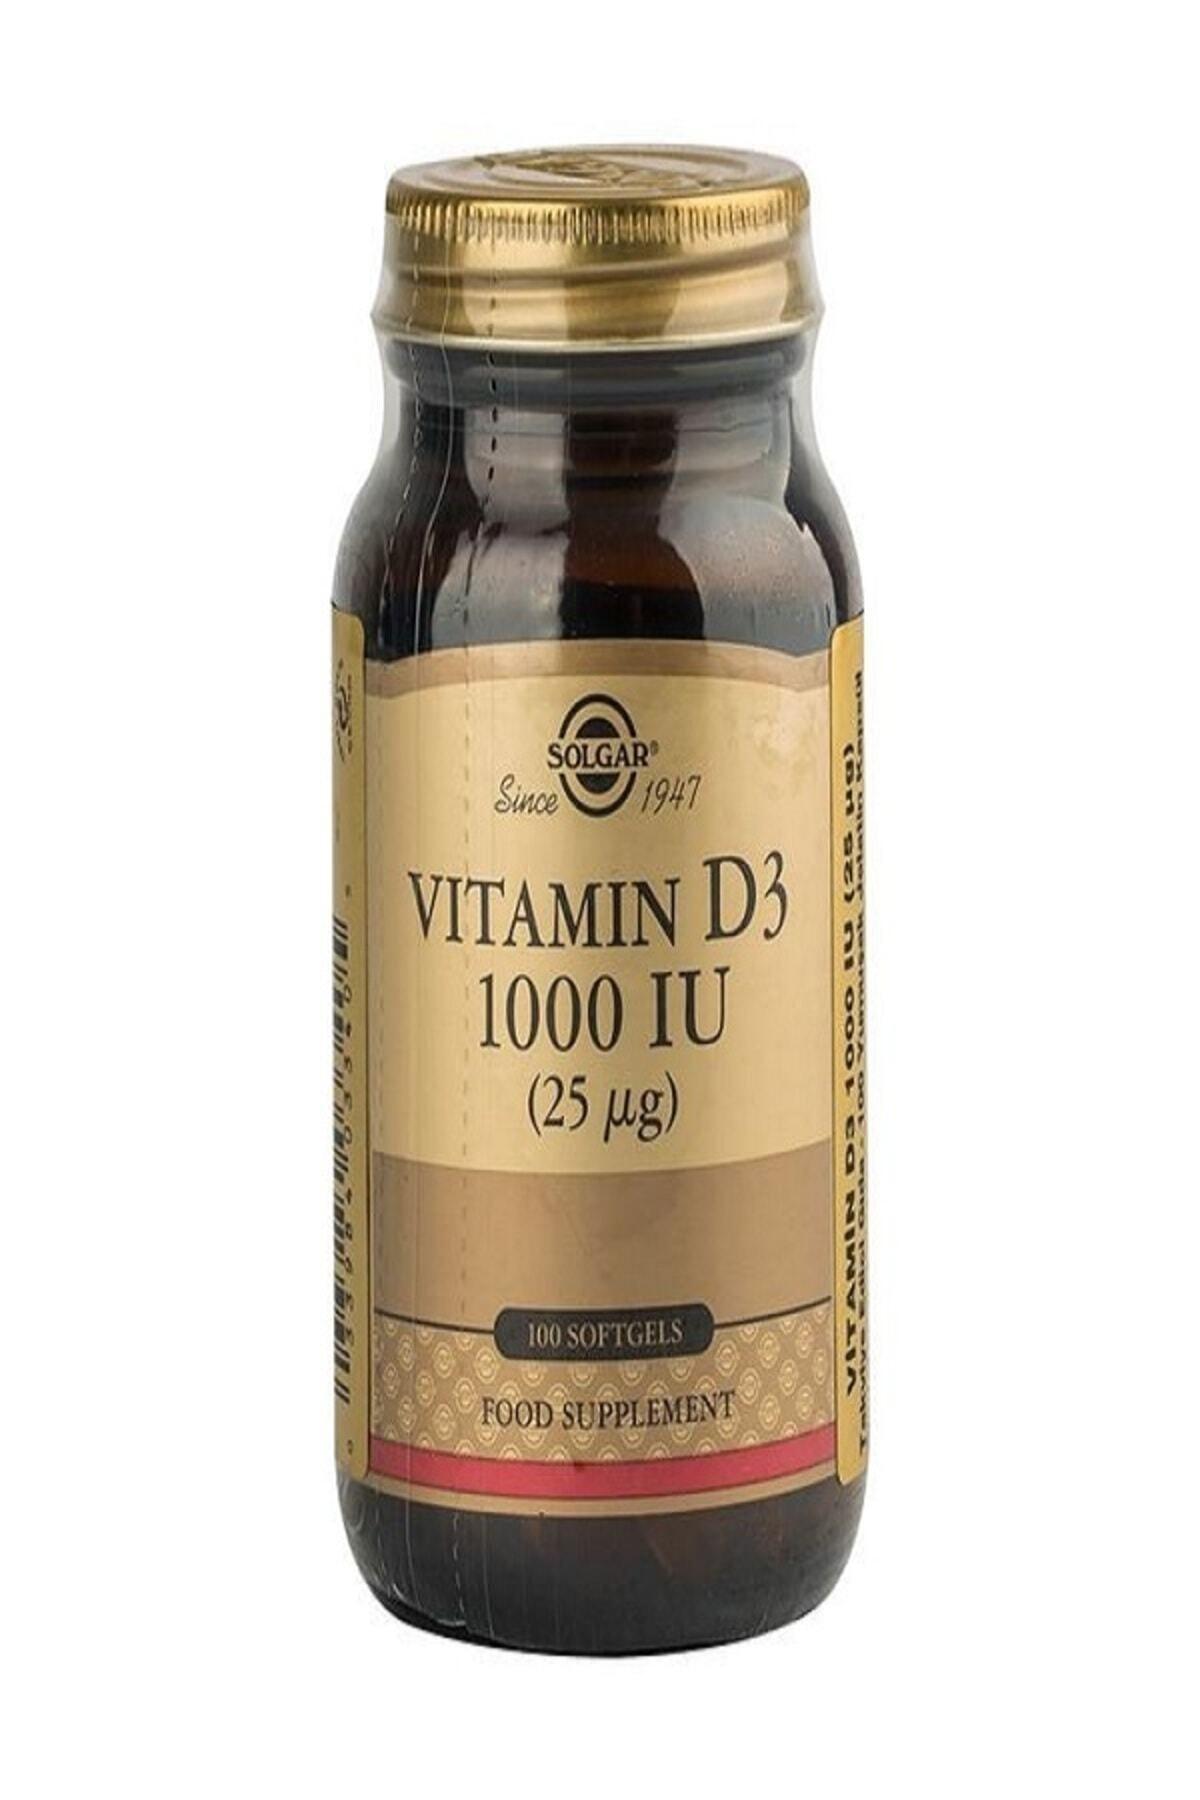 Solgar Vitamin D3 1000 Iu 100 Softgel 1